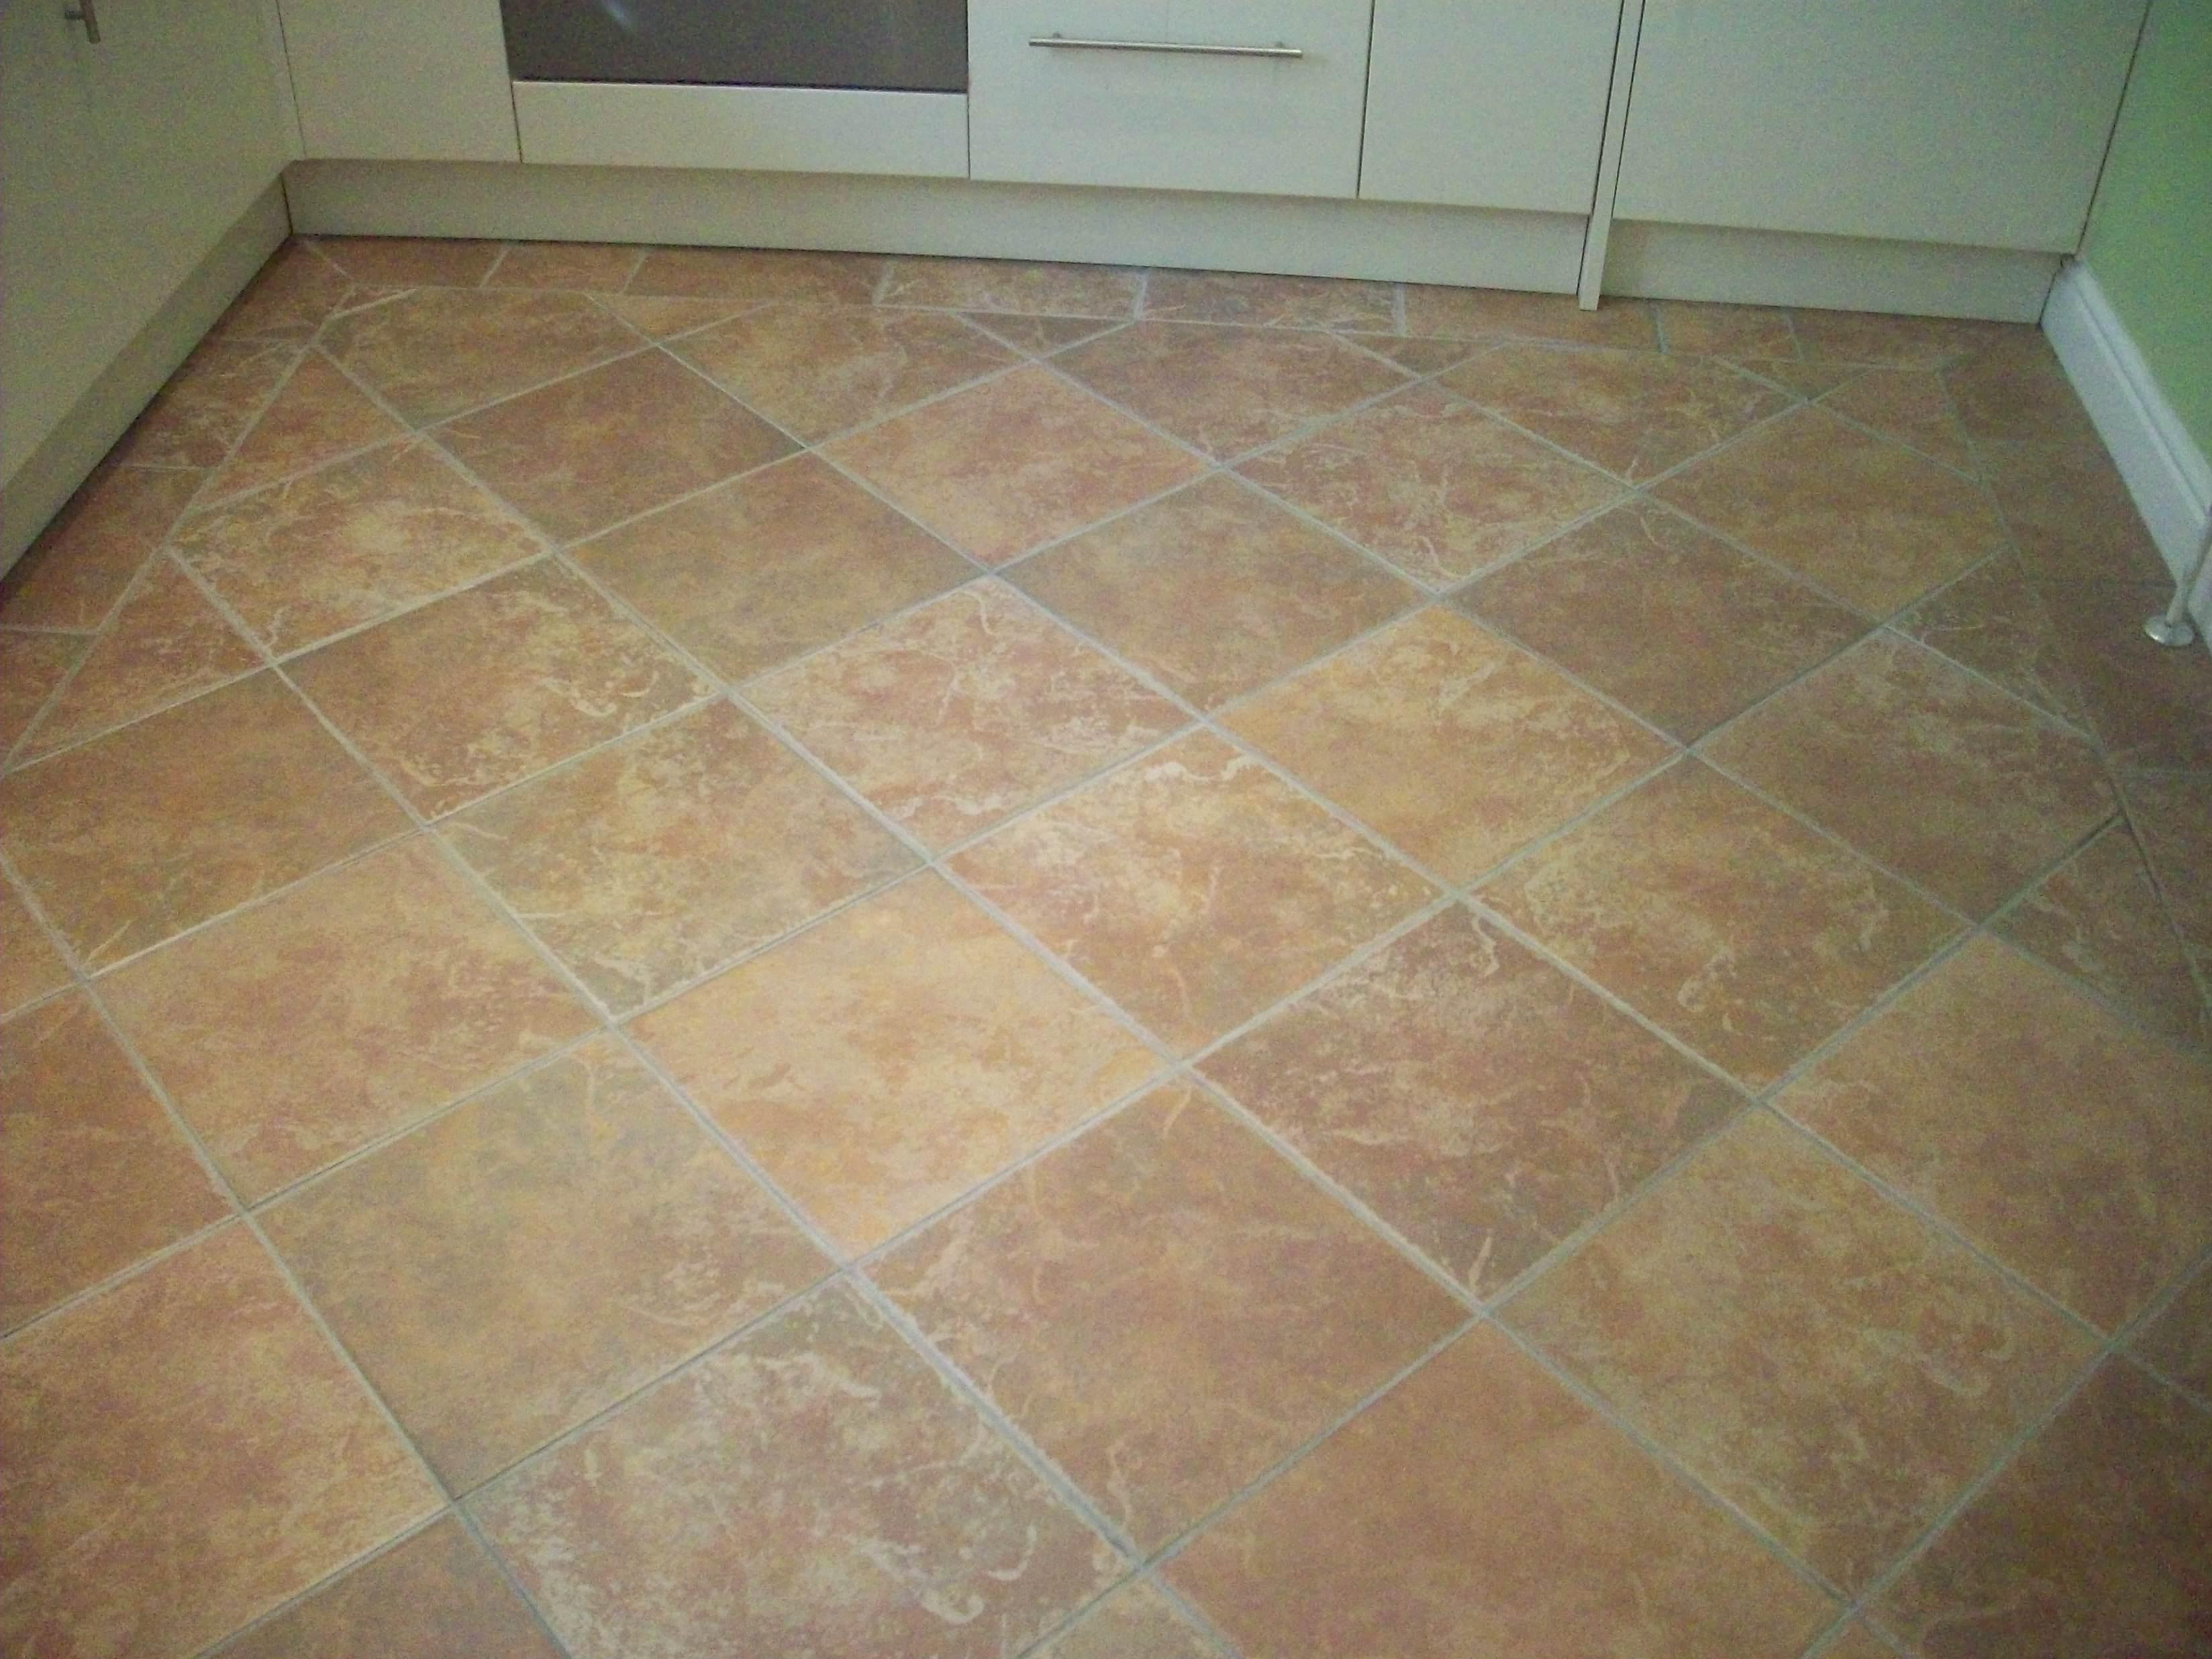 Floors Restored - Natural Stone Cleaning & Polishing, Ceramic Tiles ...